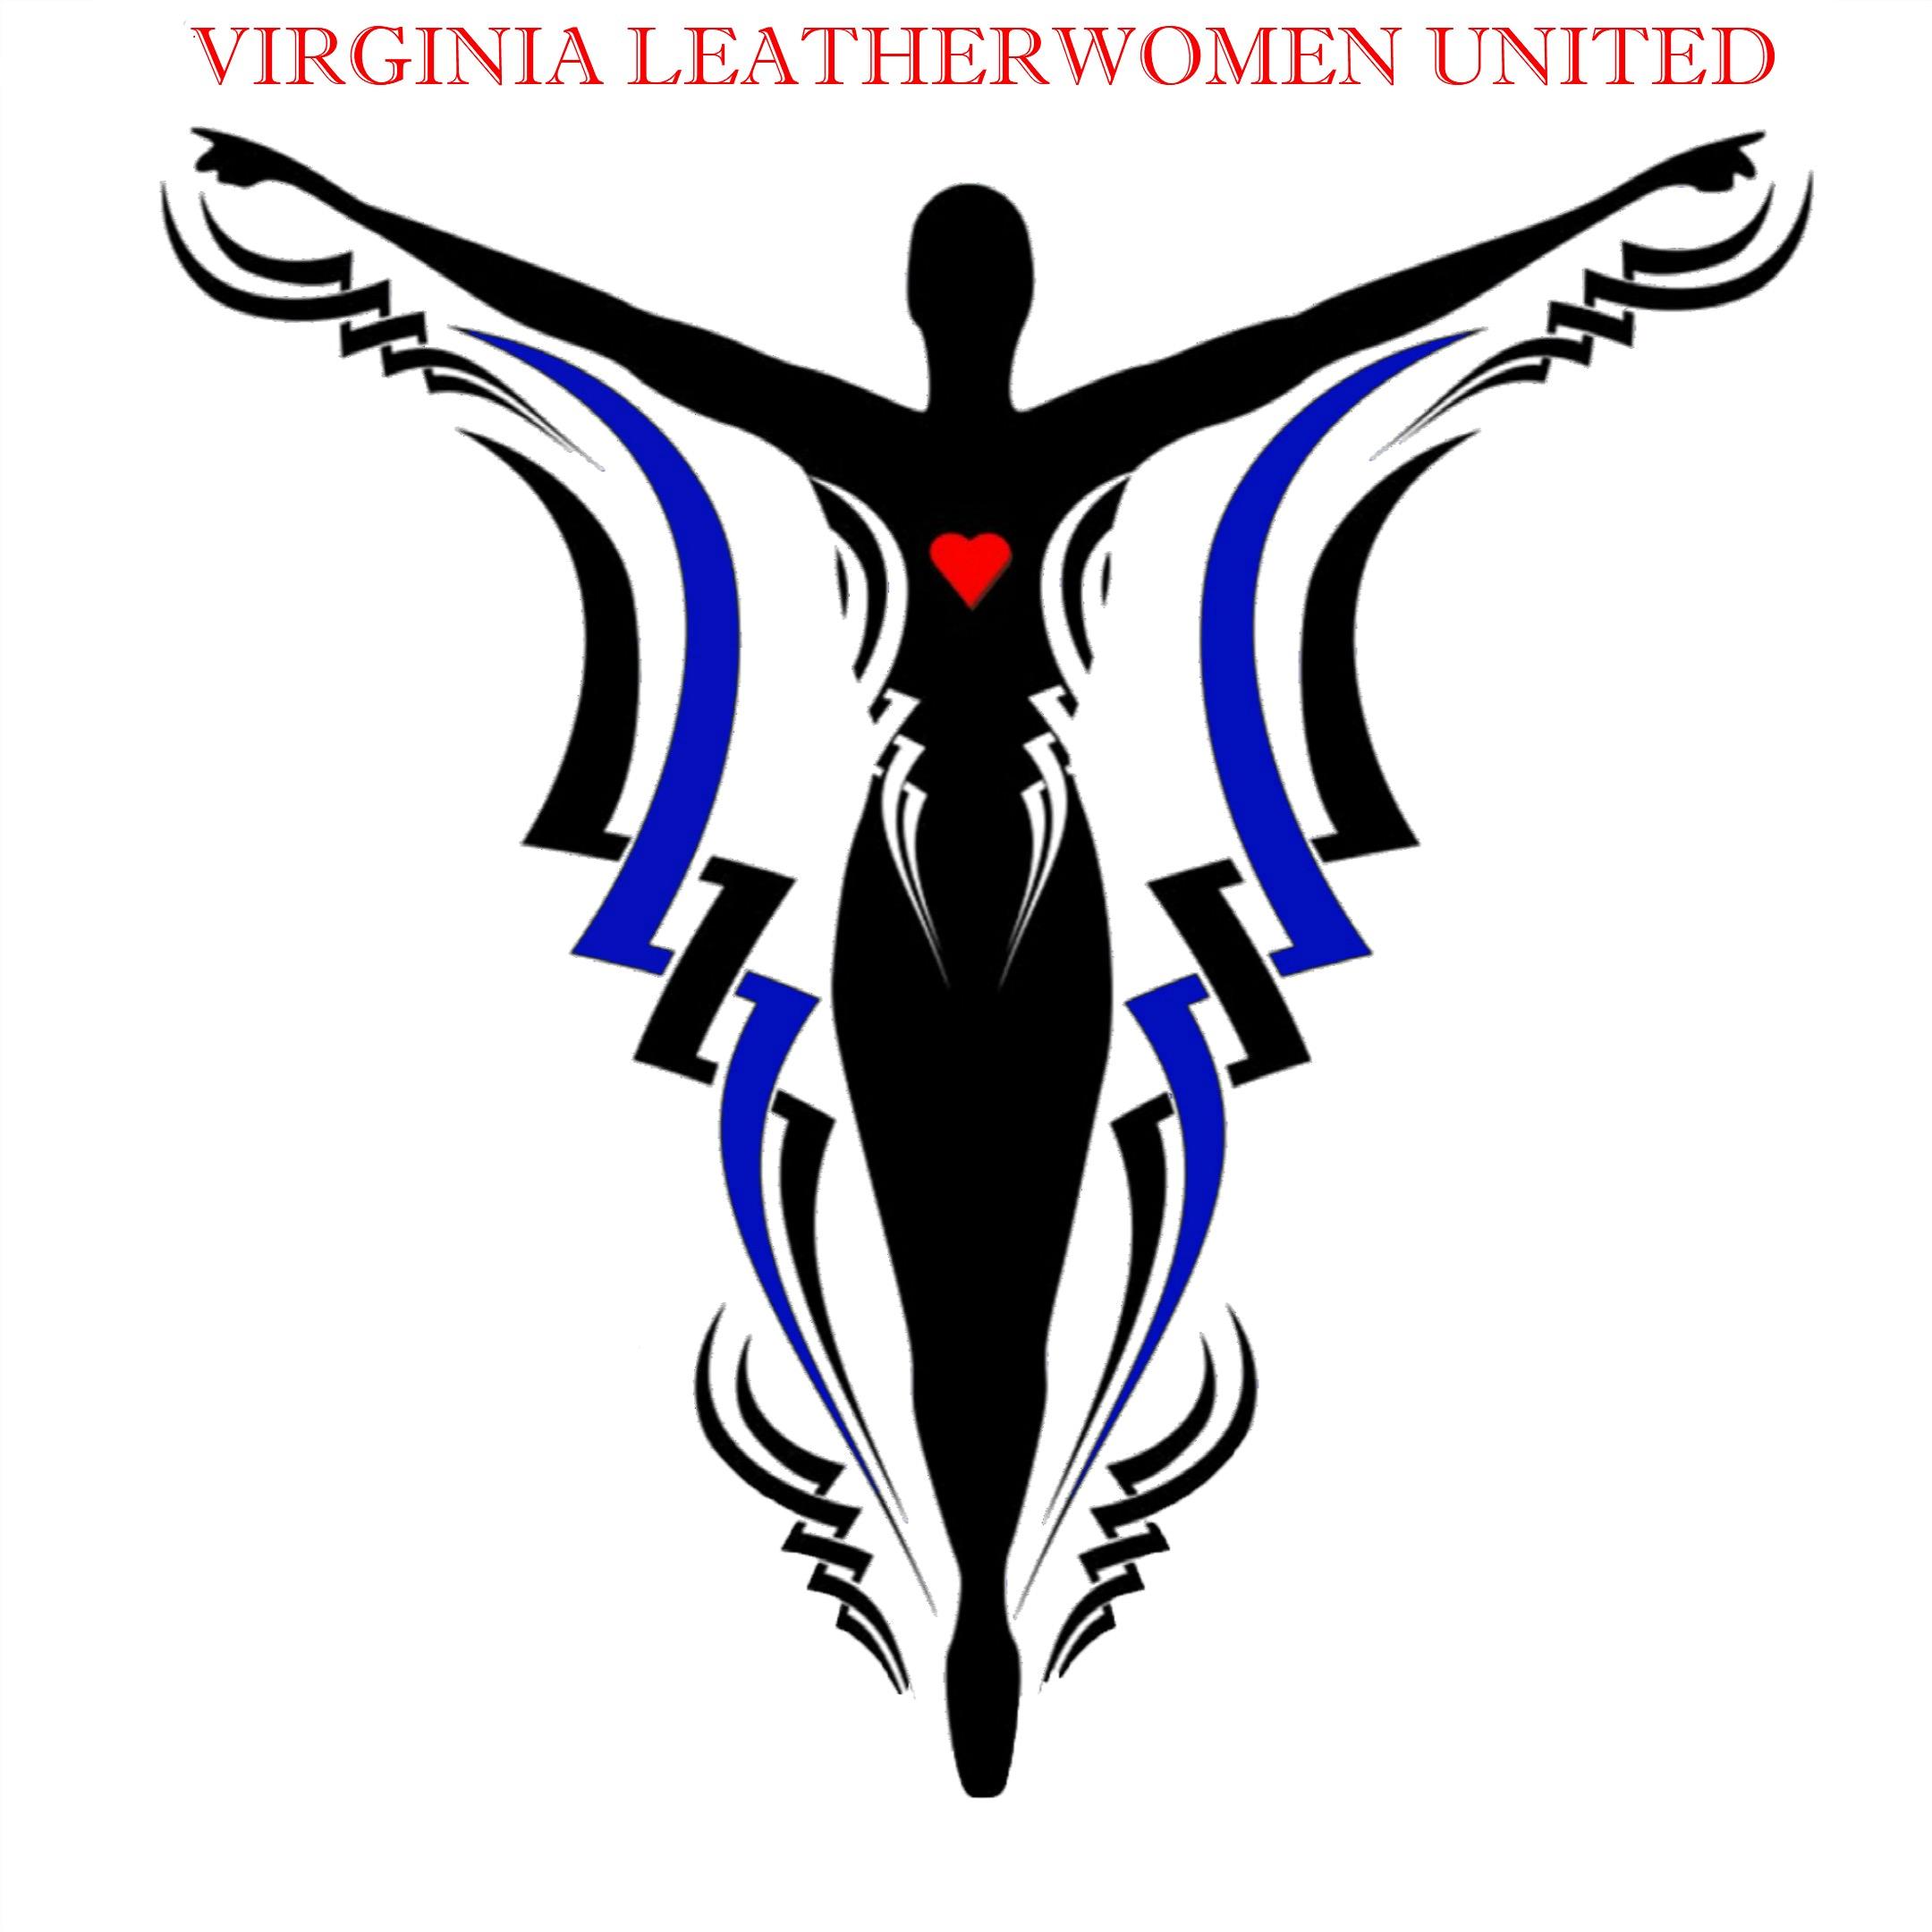 Virginia Leatherwomen United